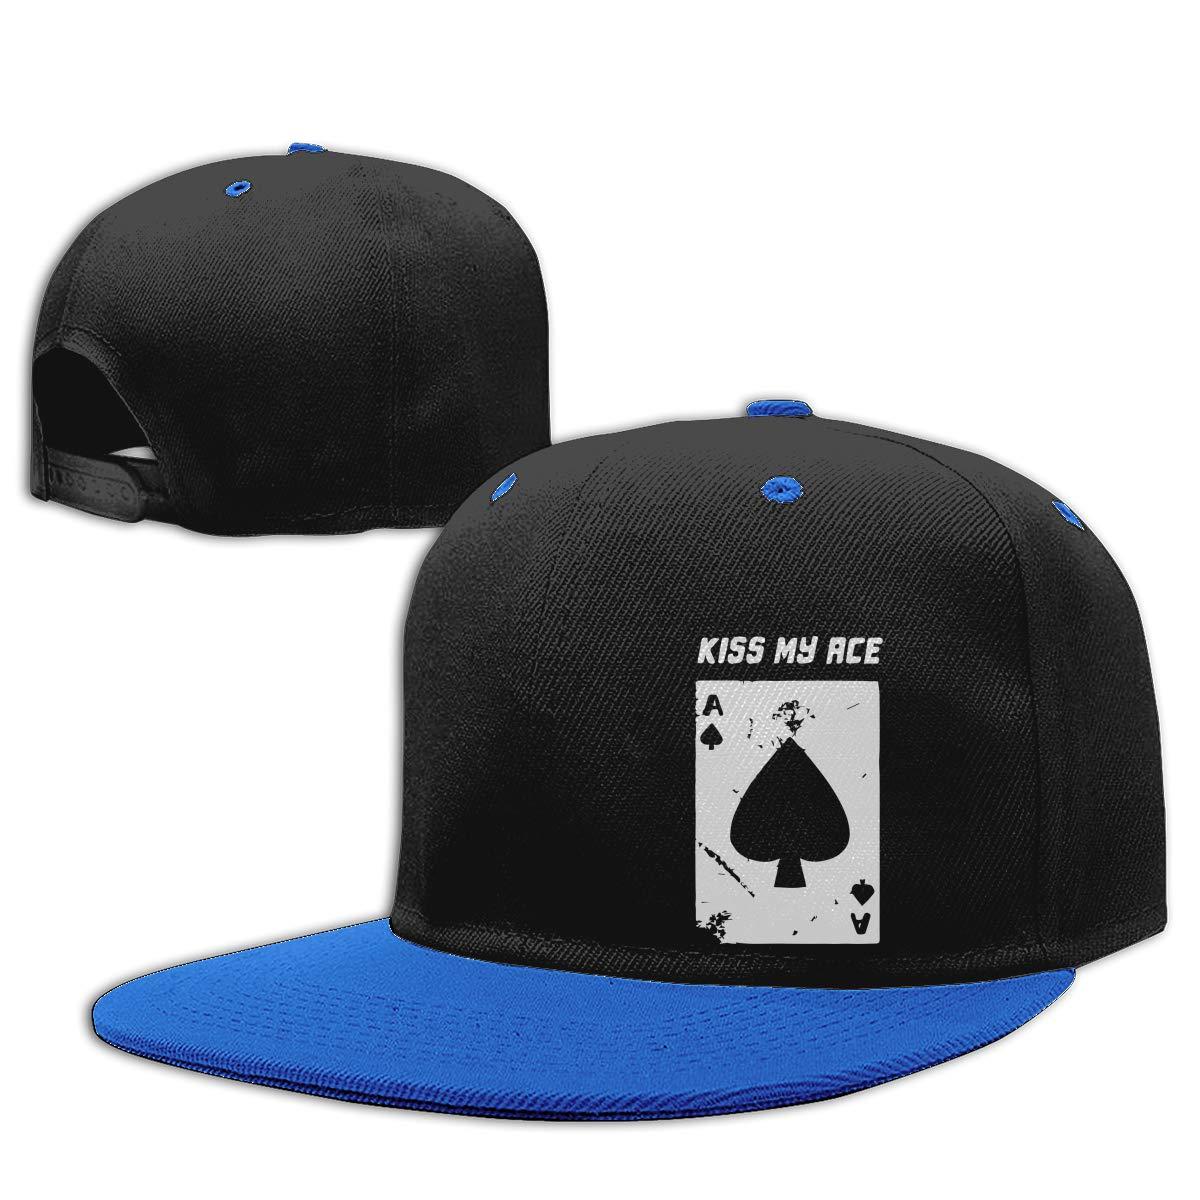 Ace Poker Cards Unisex Flat Bill Baseball Caps Women Men Hiphop Cap